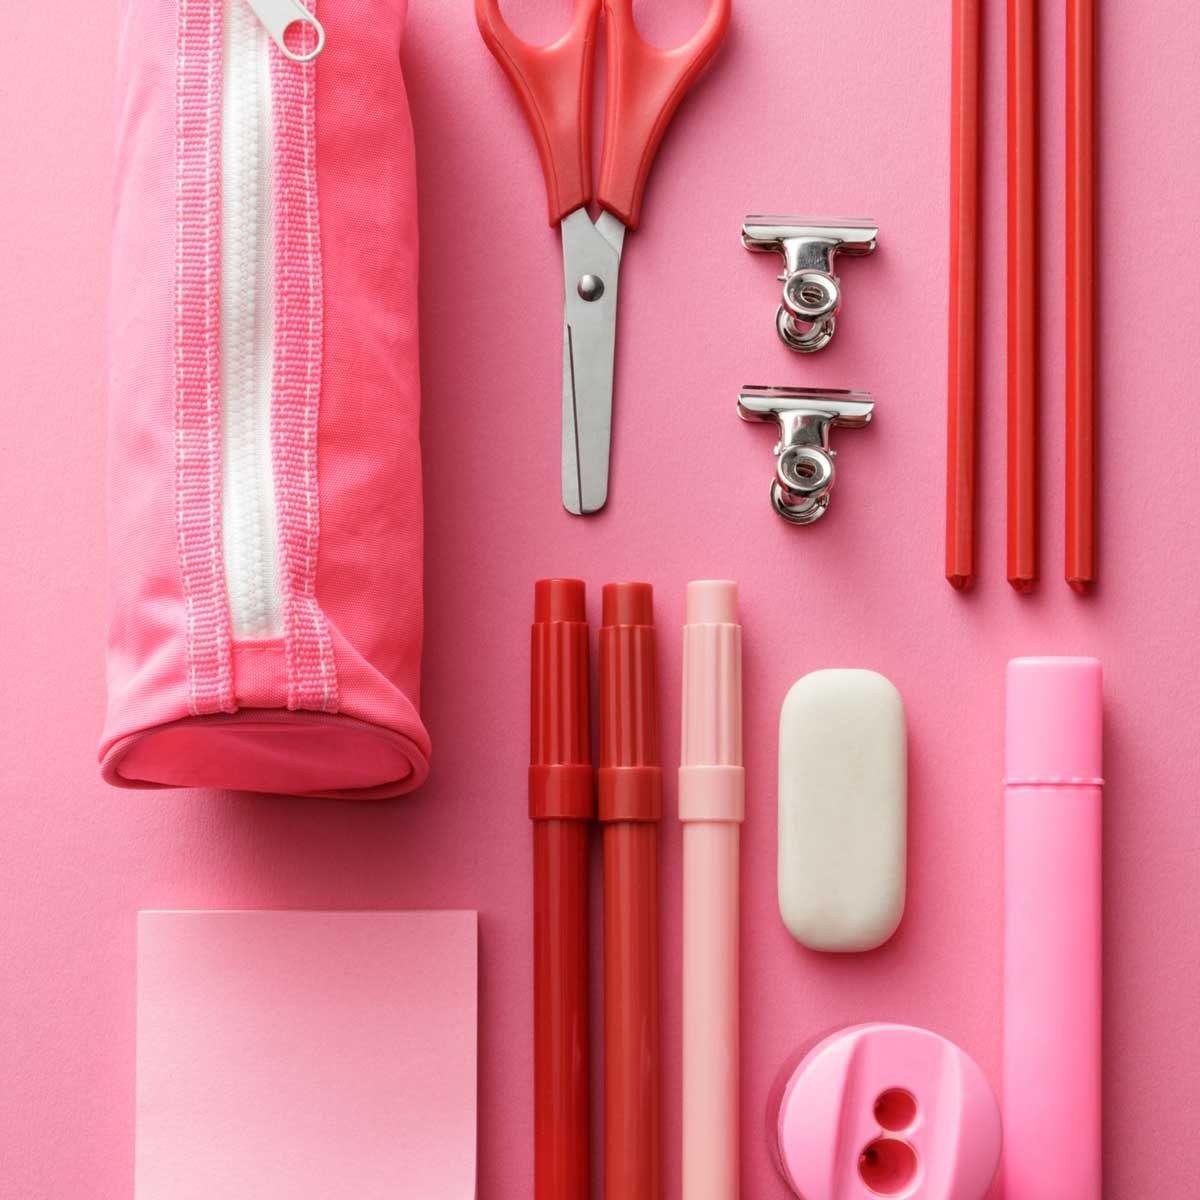 Color coded school supplies